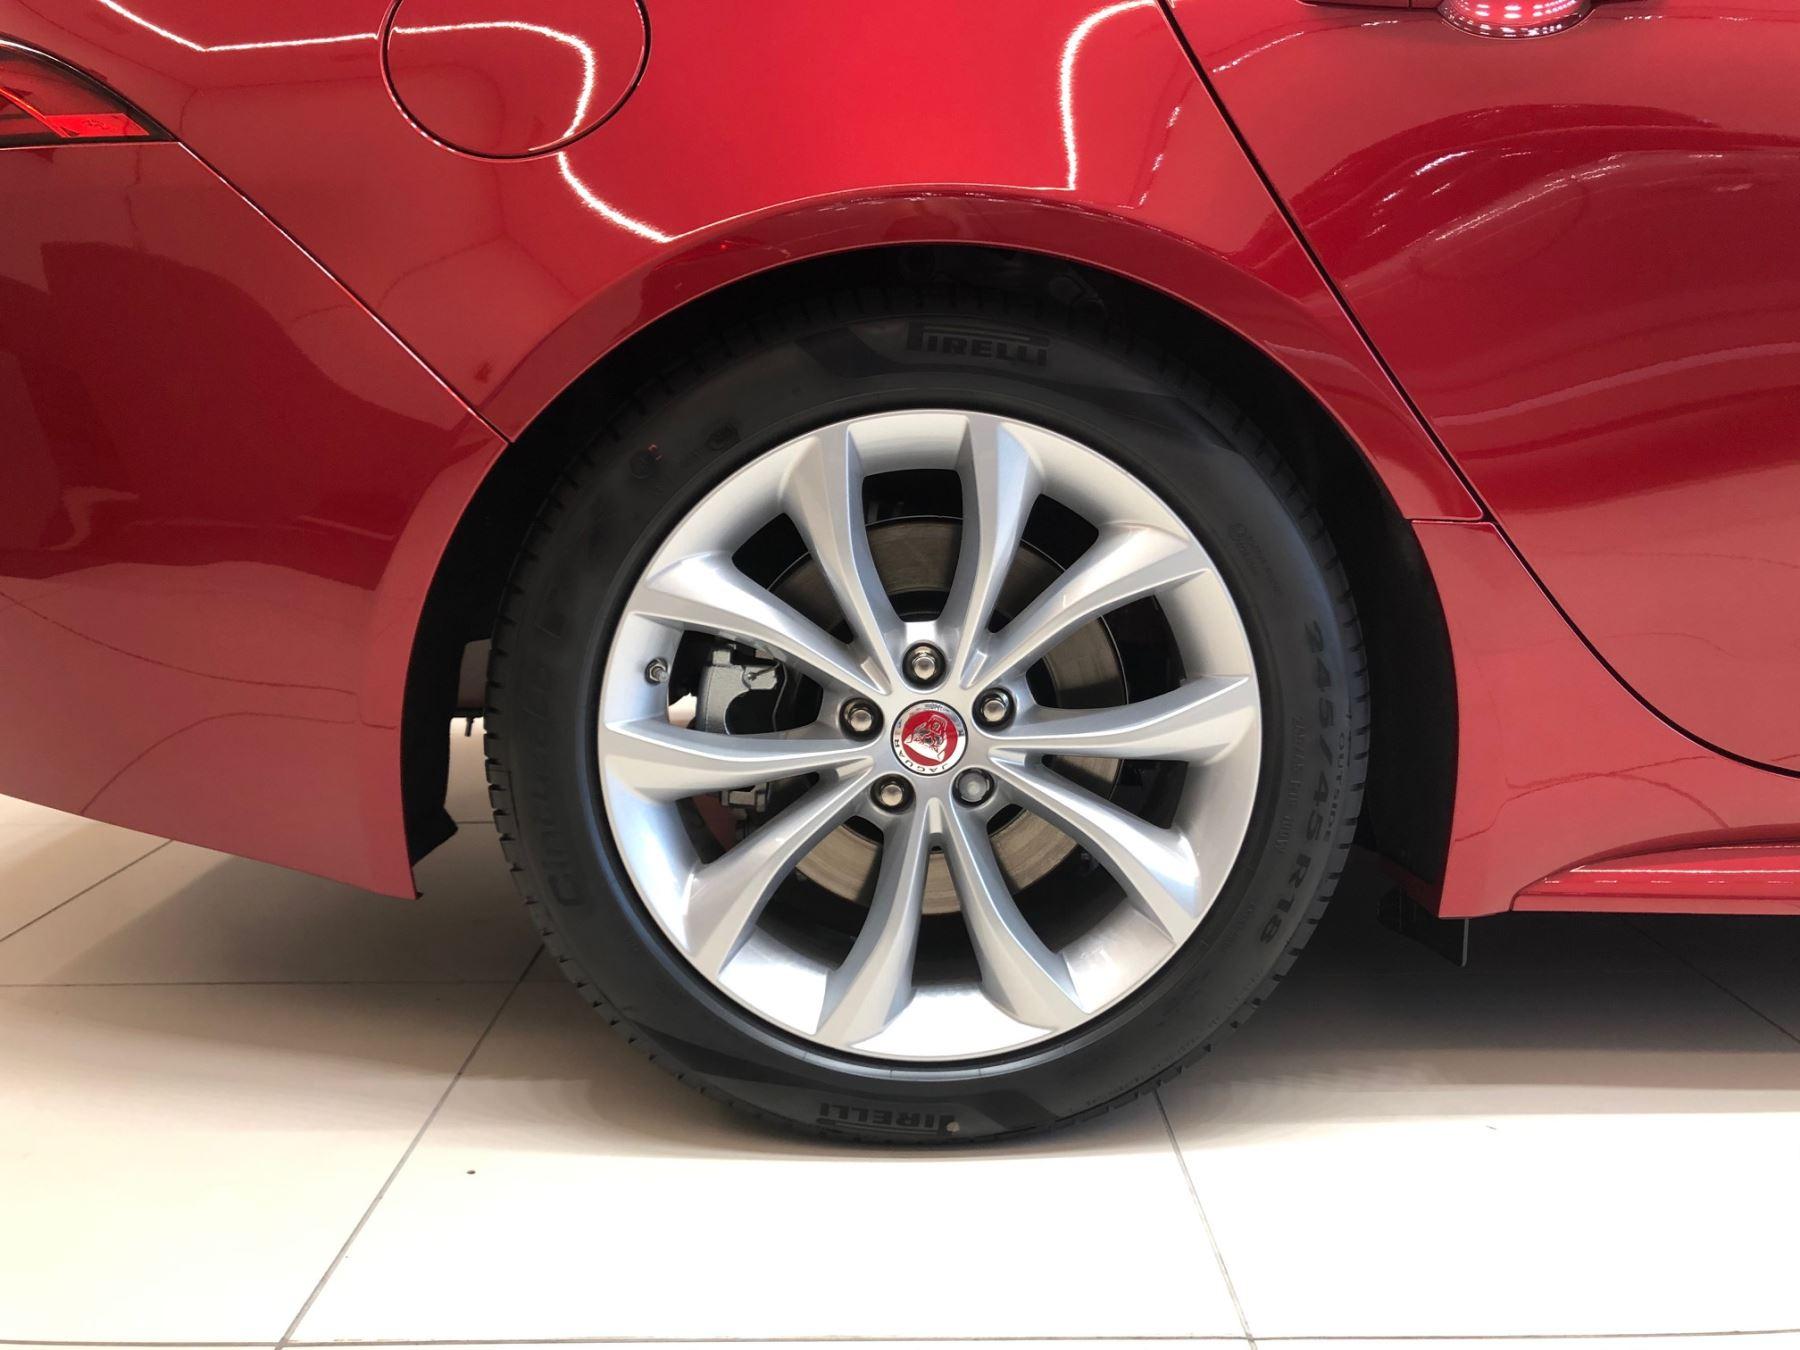 Jaguar XF SPORTBRAKE 2.0d 180 R-Sport image 7